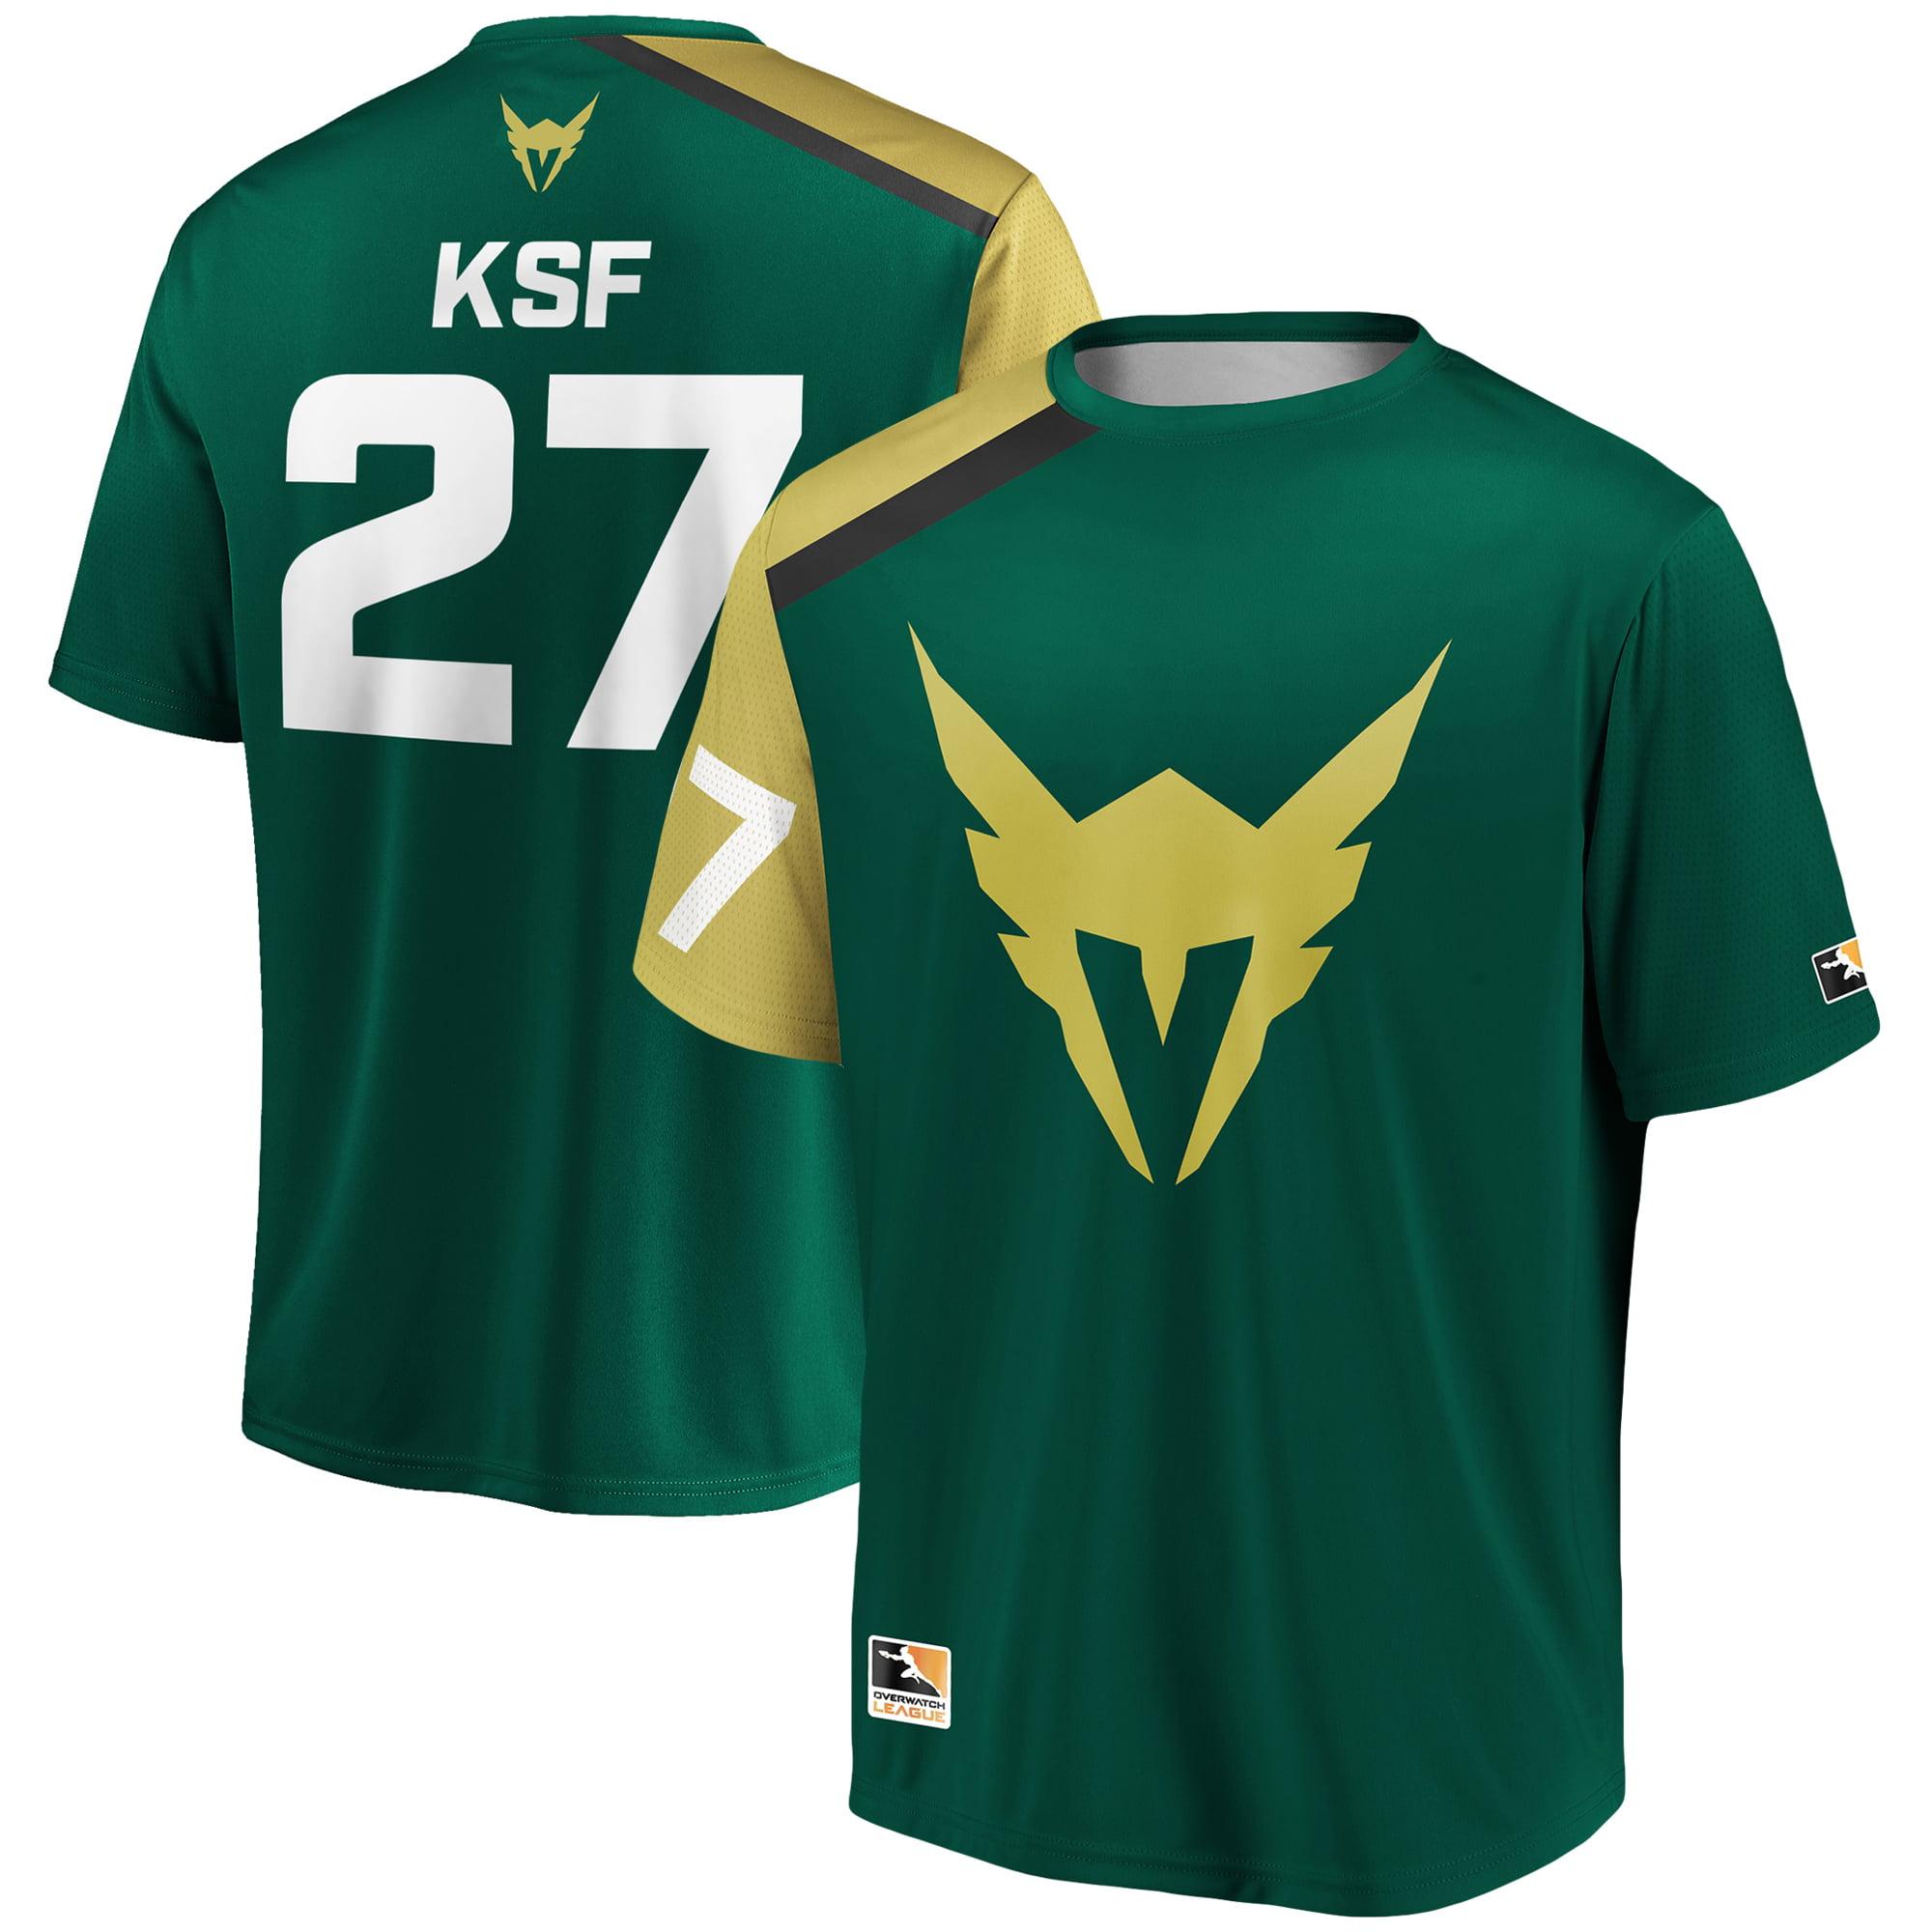 KSF Los Angeles Valiant Overwatch League Replica Home Jersey - Green